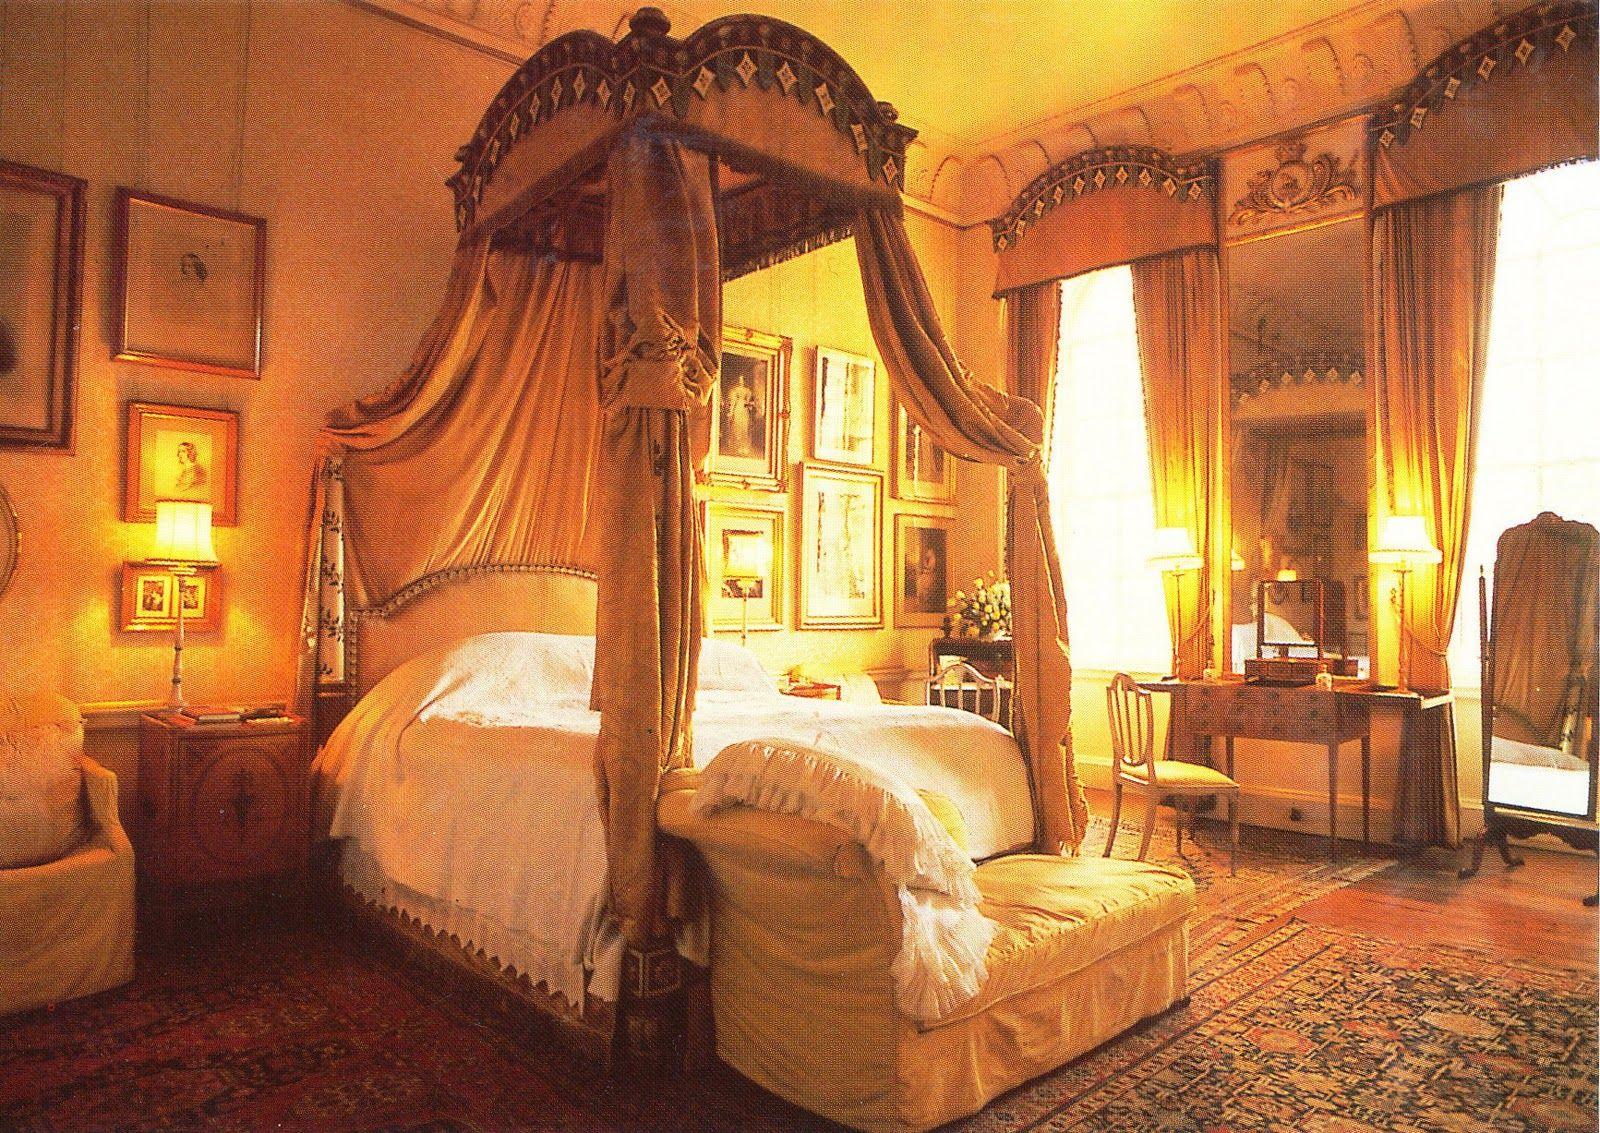 Princess Castle Bedroom